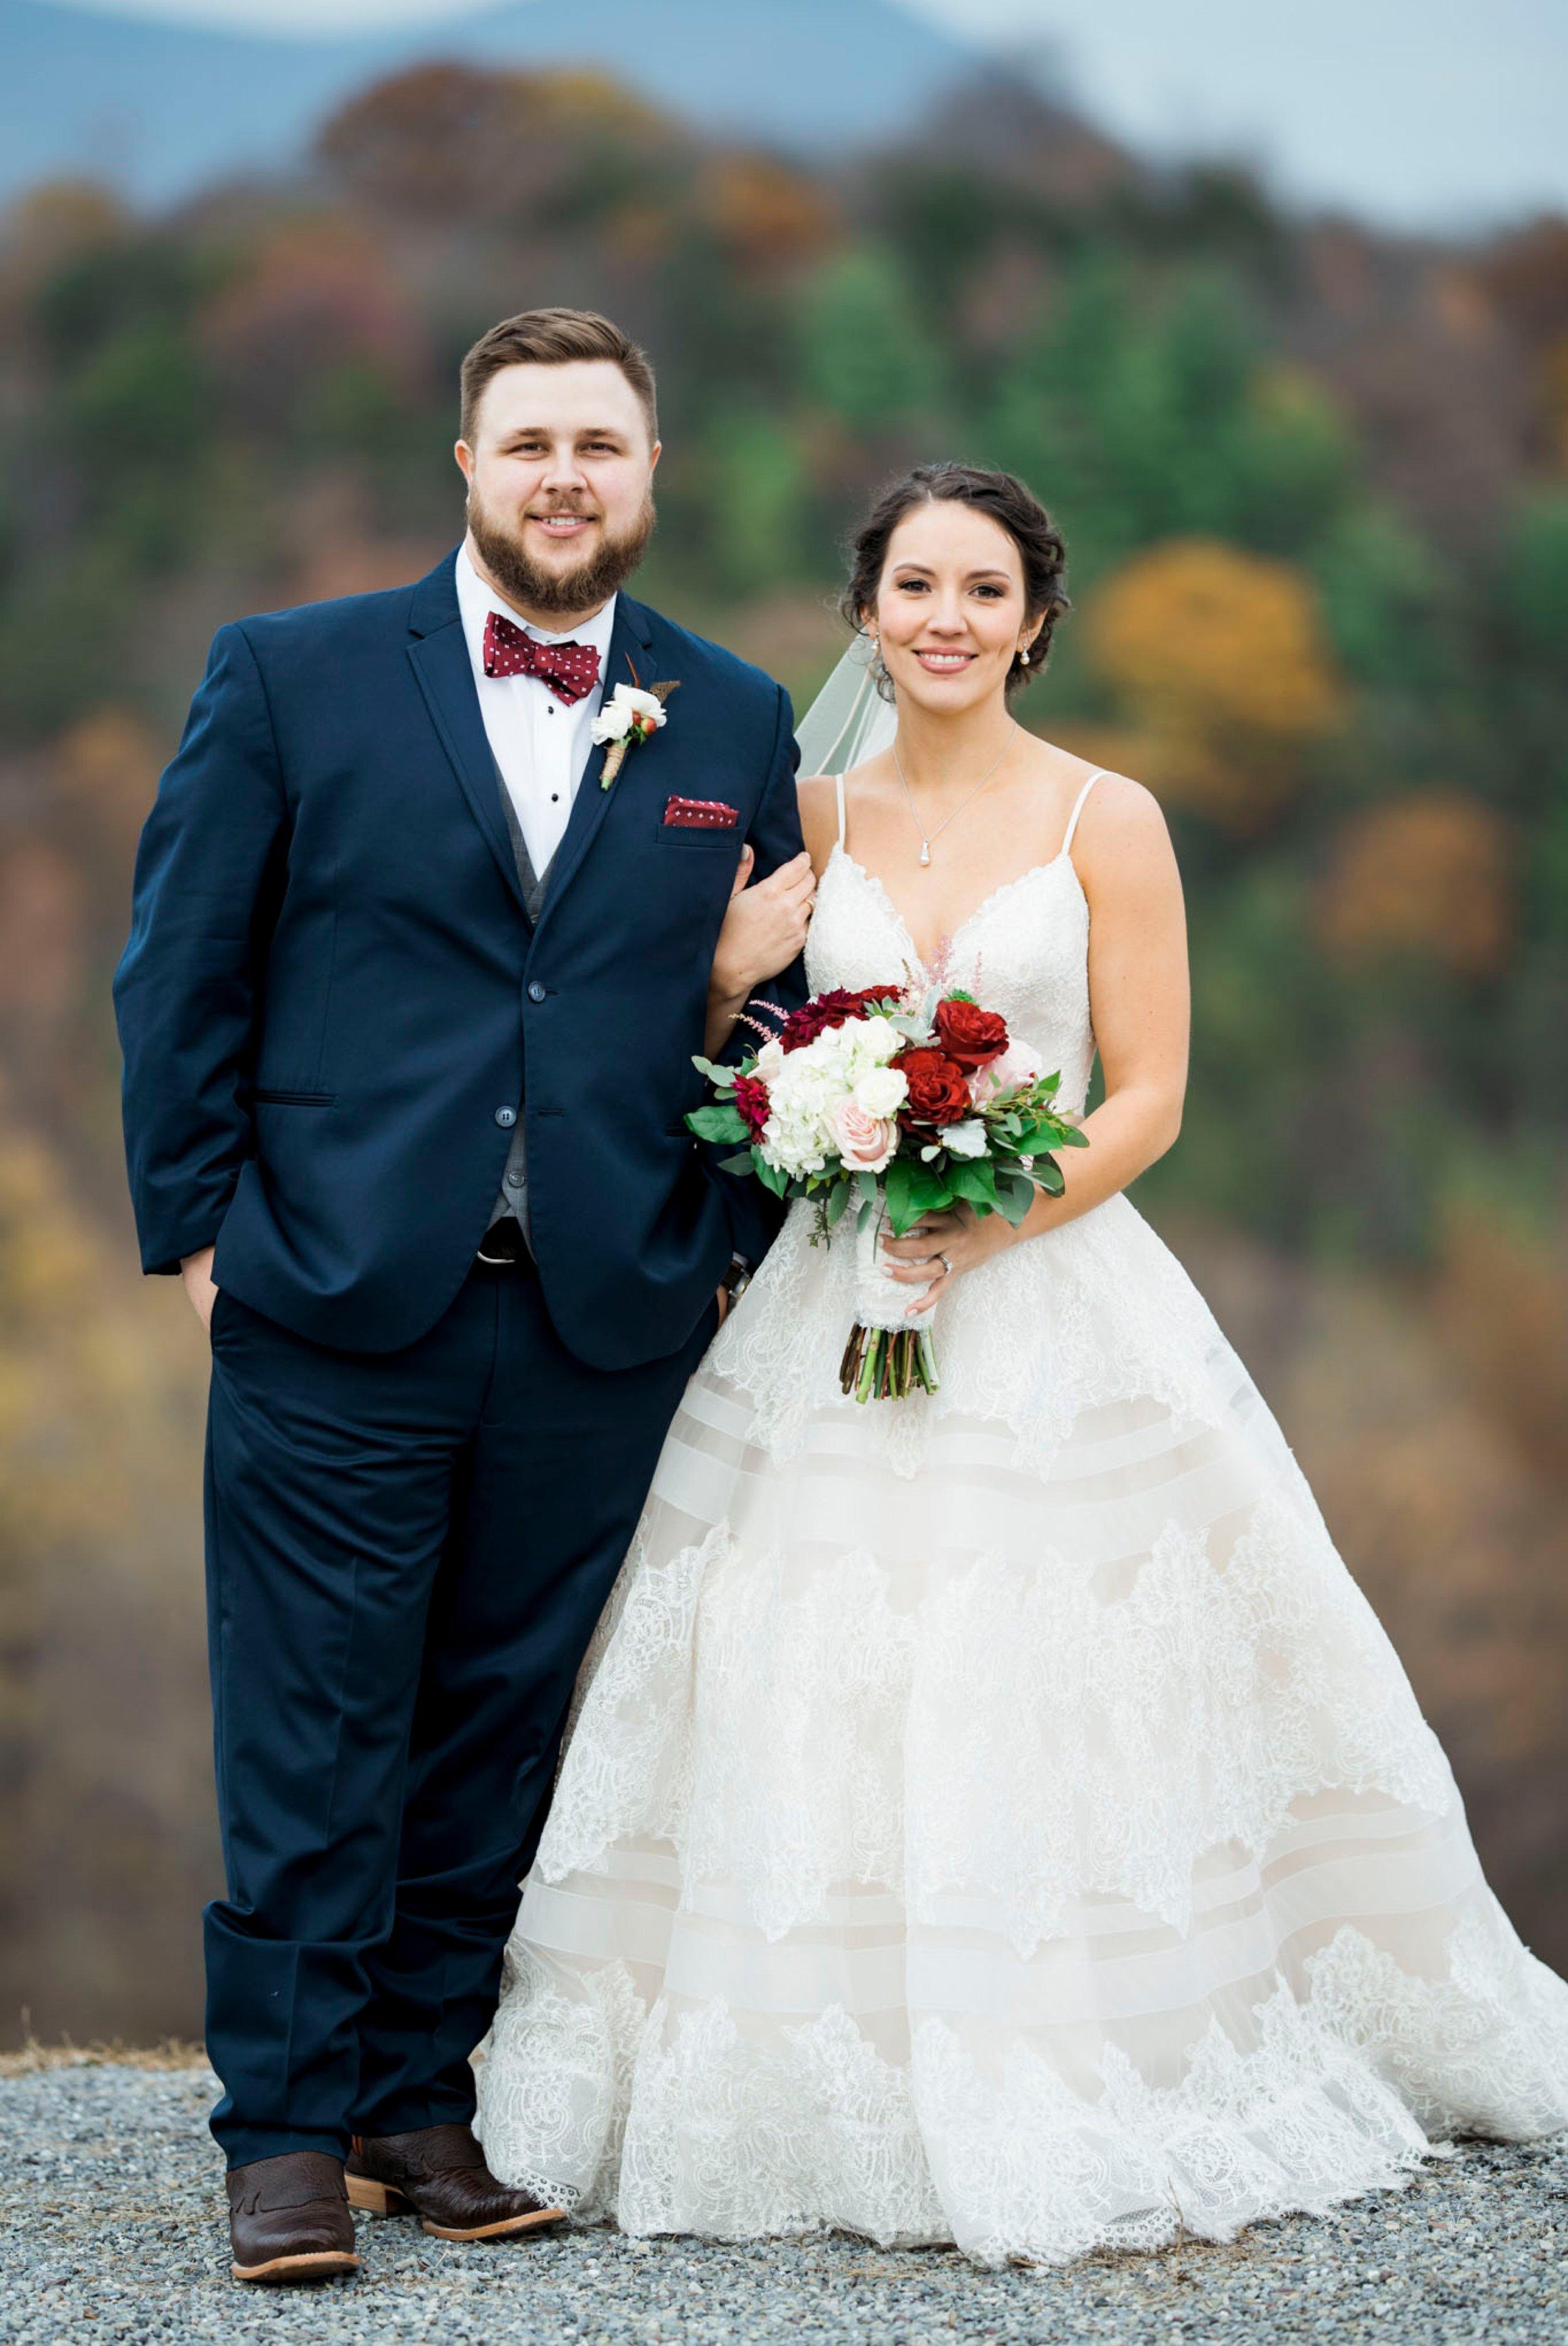 IrvineEstate_LexingtonVA_Wedding_FallWedding_VirginiaWeddingPhotographer 77.jpg